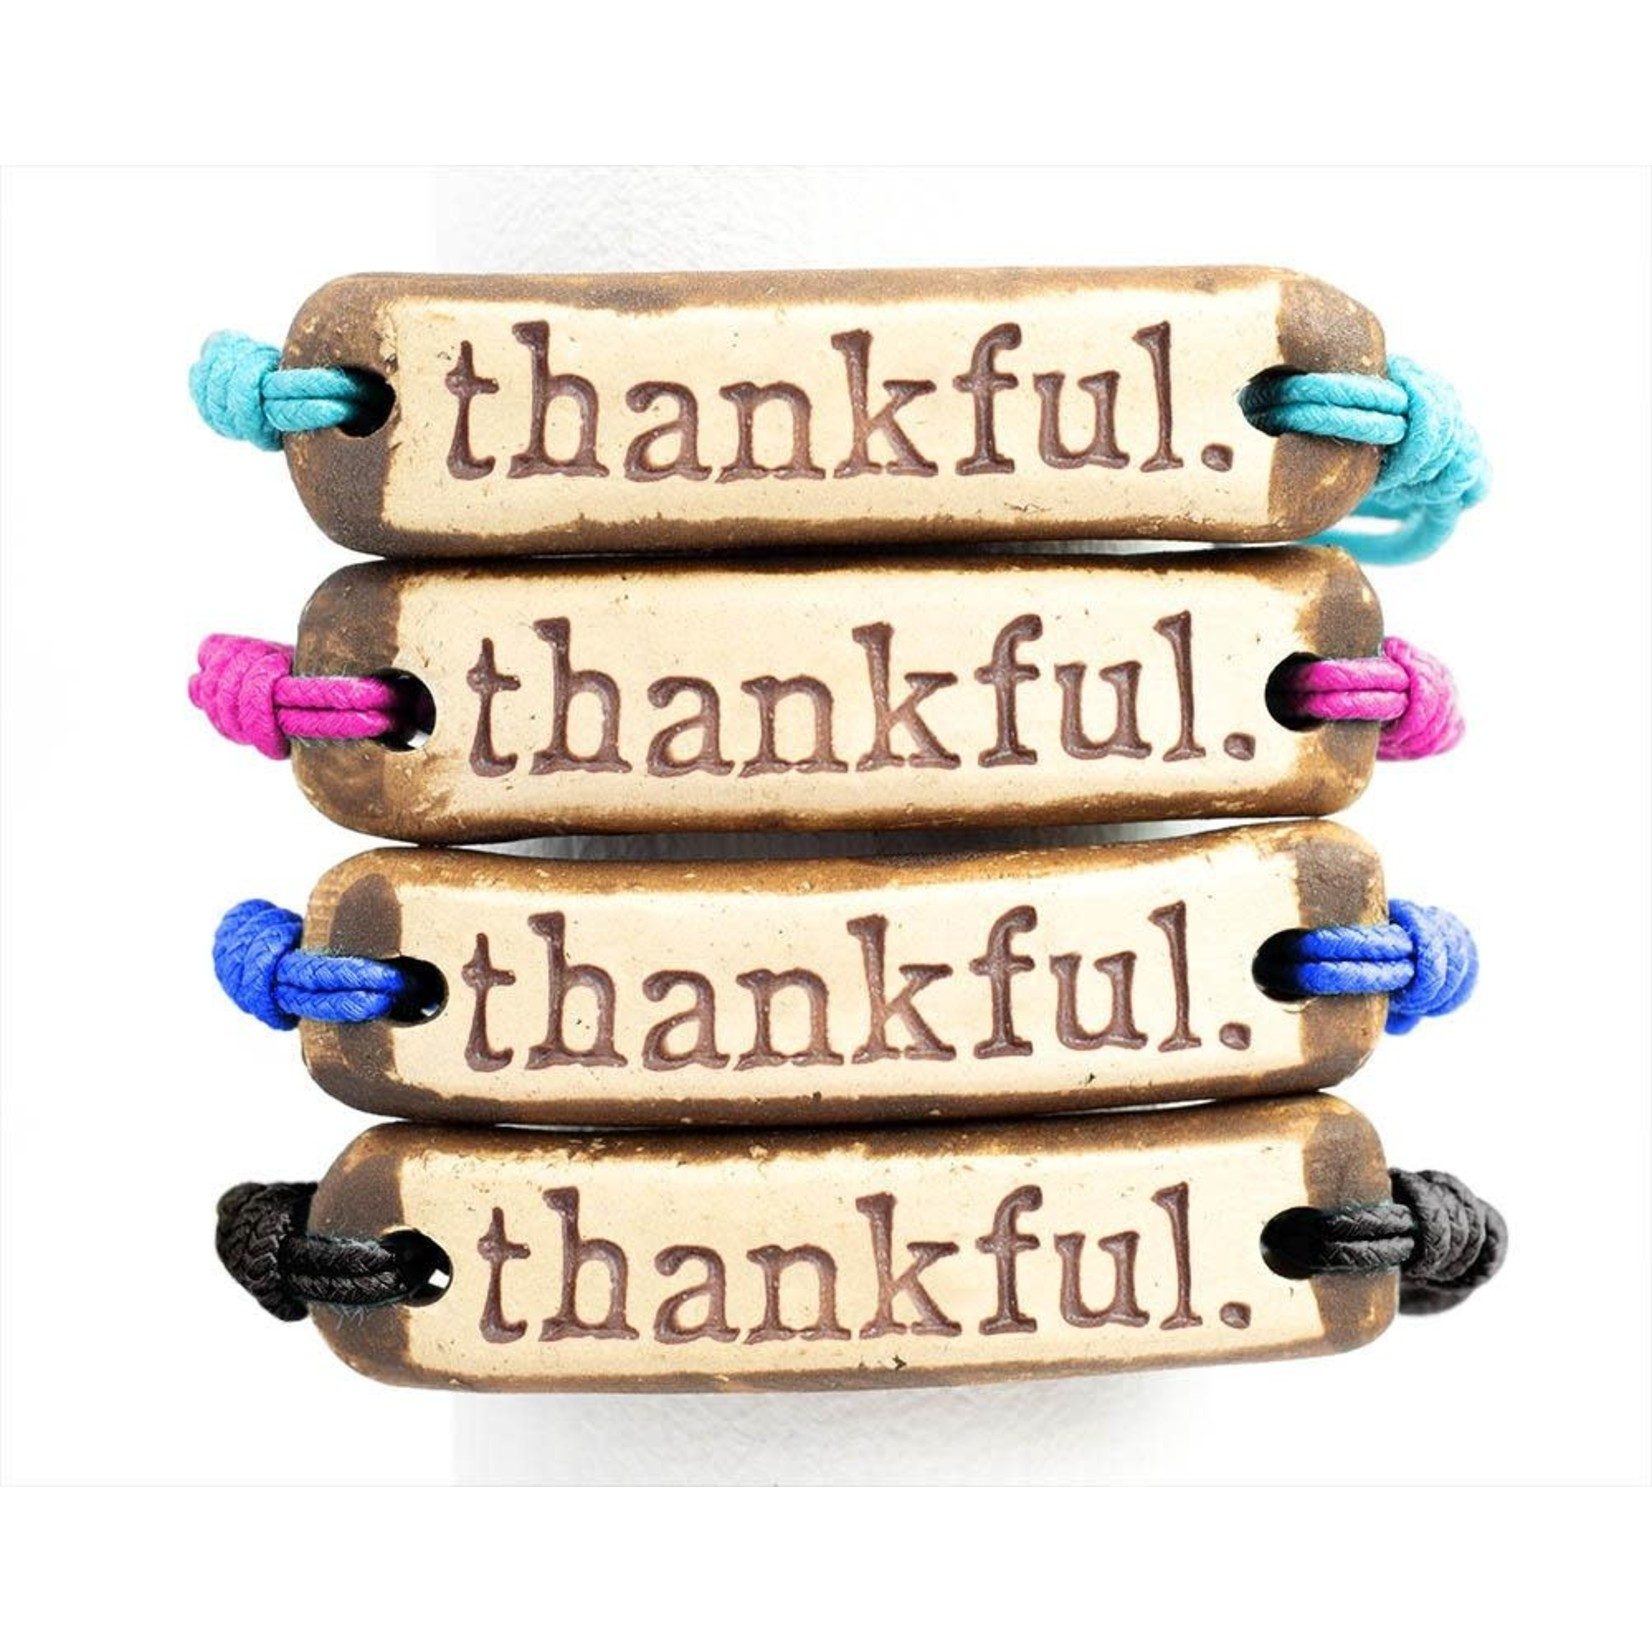 MudLOVE thankful